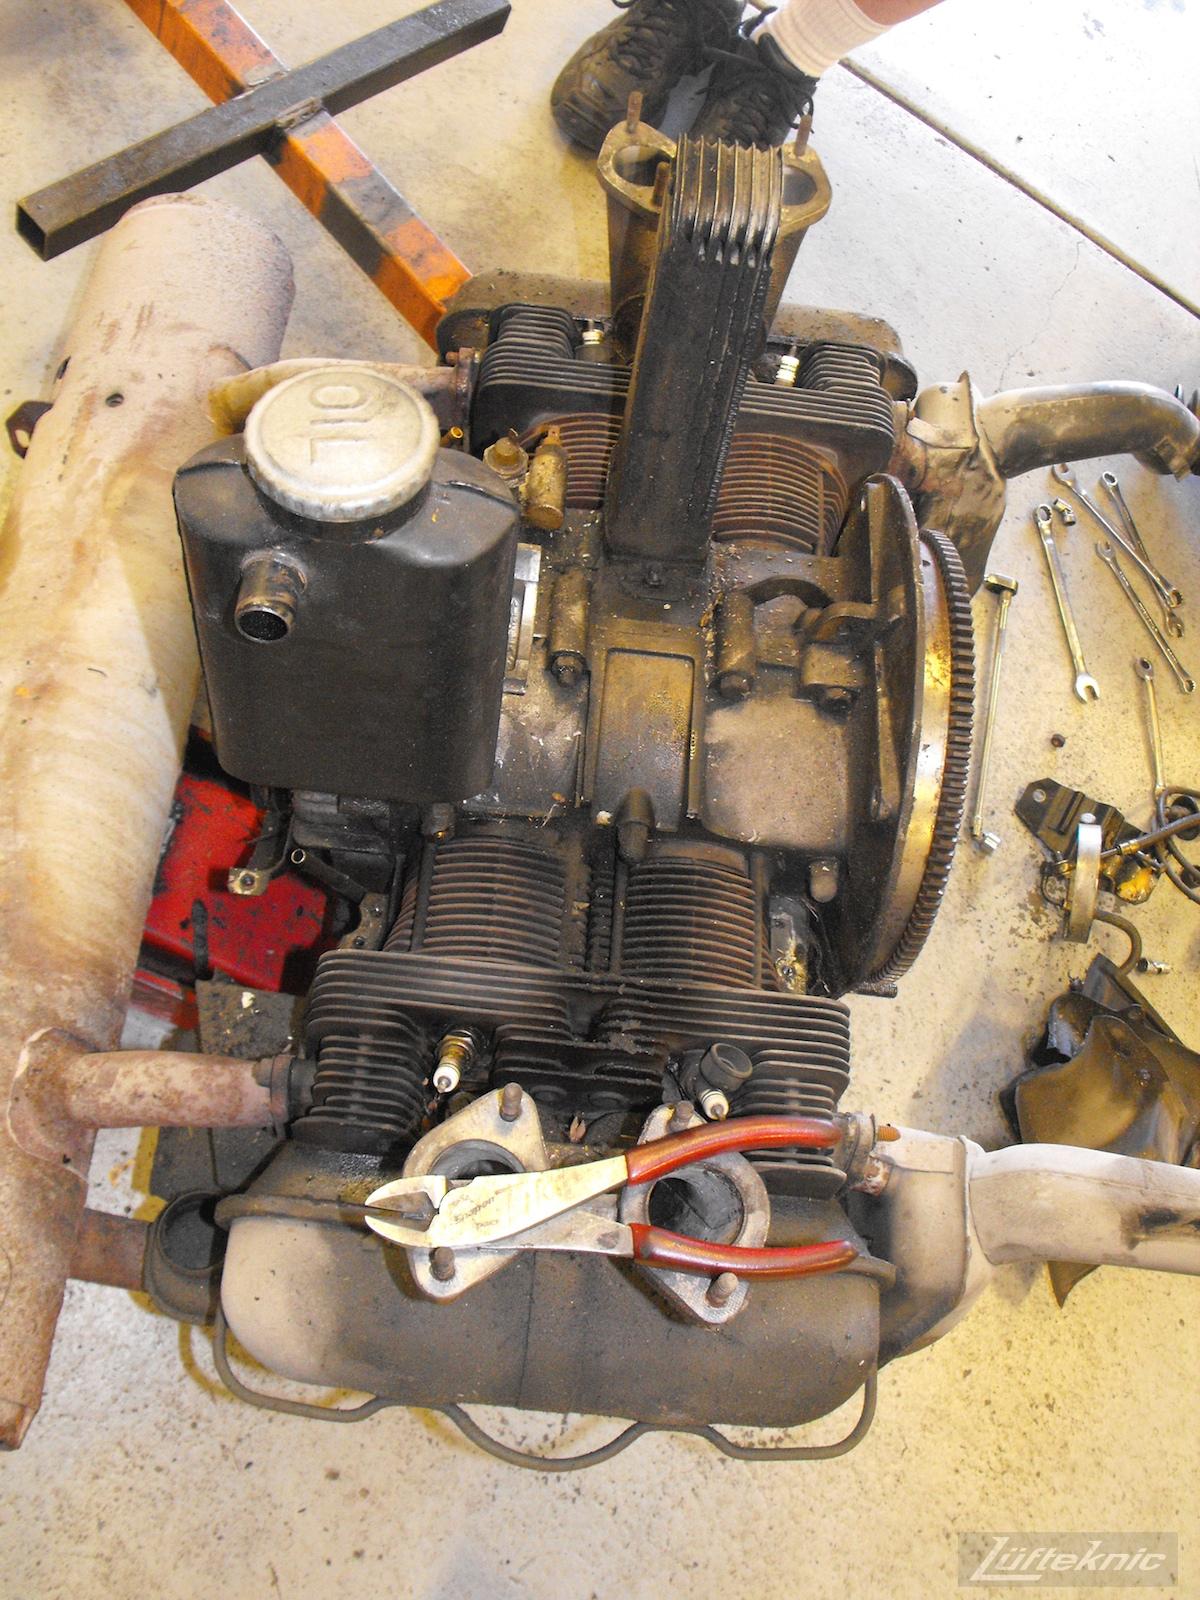 Engine removed for 1964 Porsche 356SC restoration.